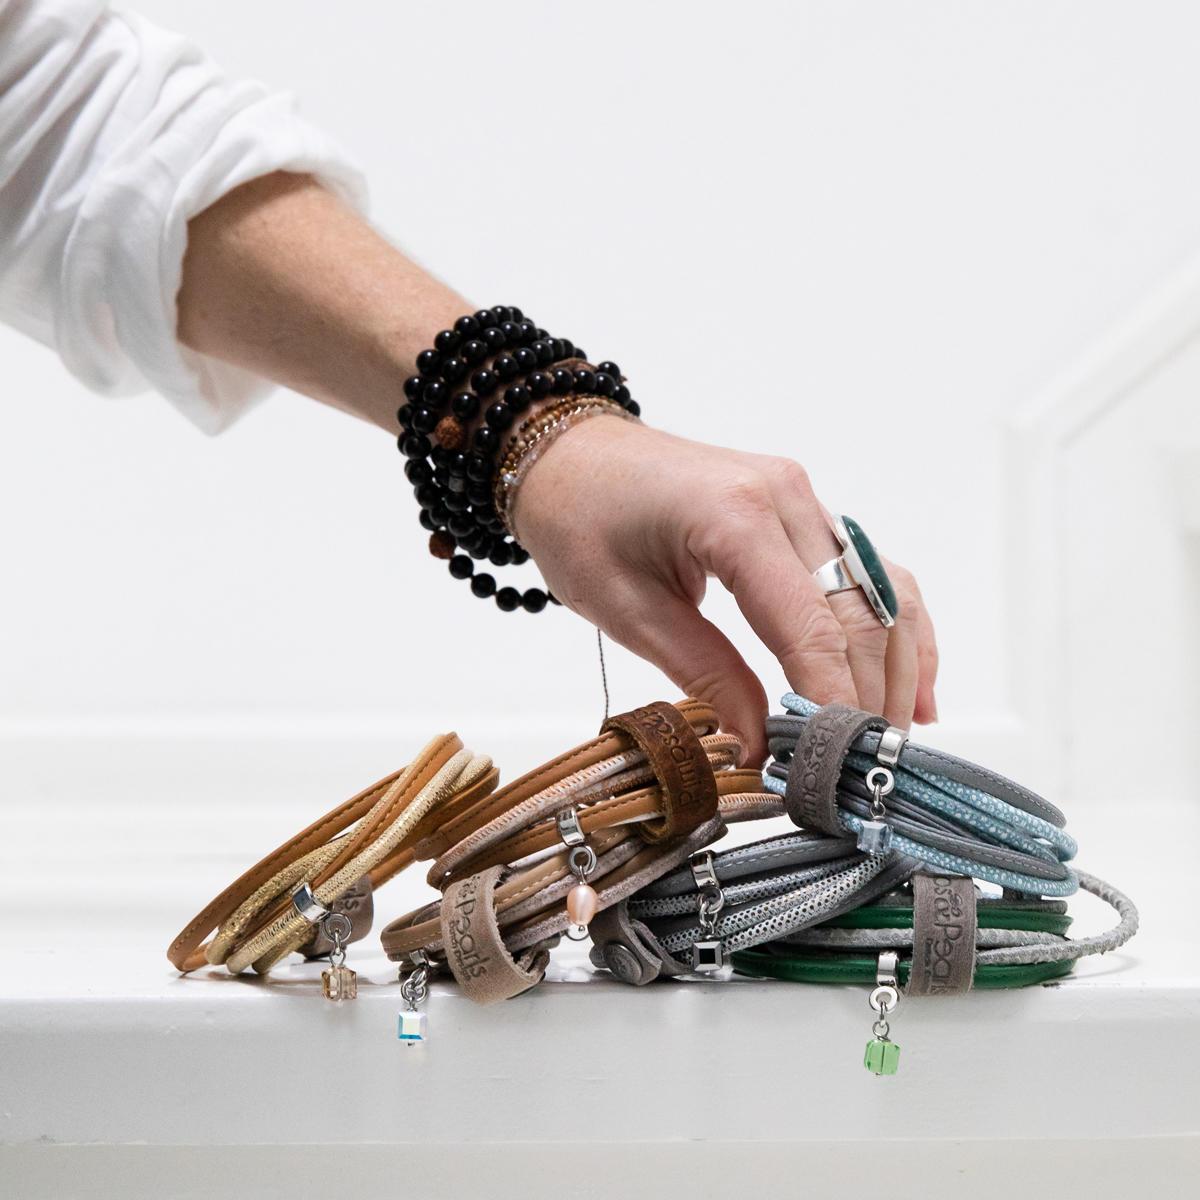 280 Moesss Floral armband ketting